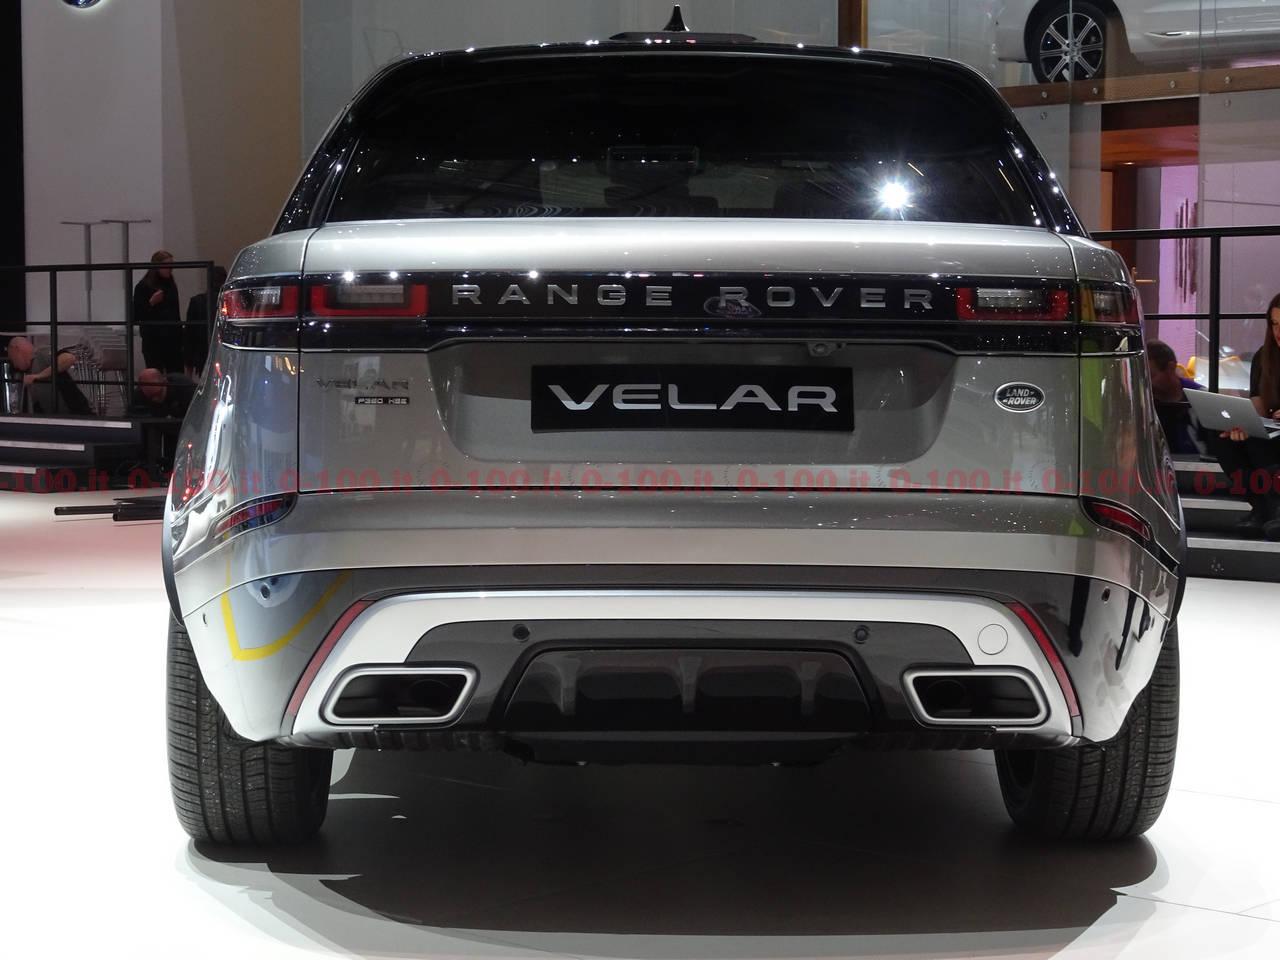 geneva-geneve-ginevra-2017-auto-show-range-rover-velar-0-100_23